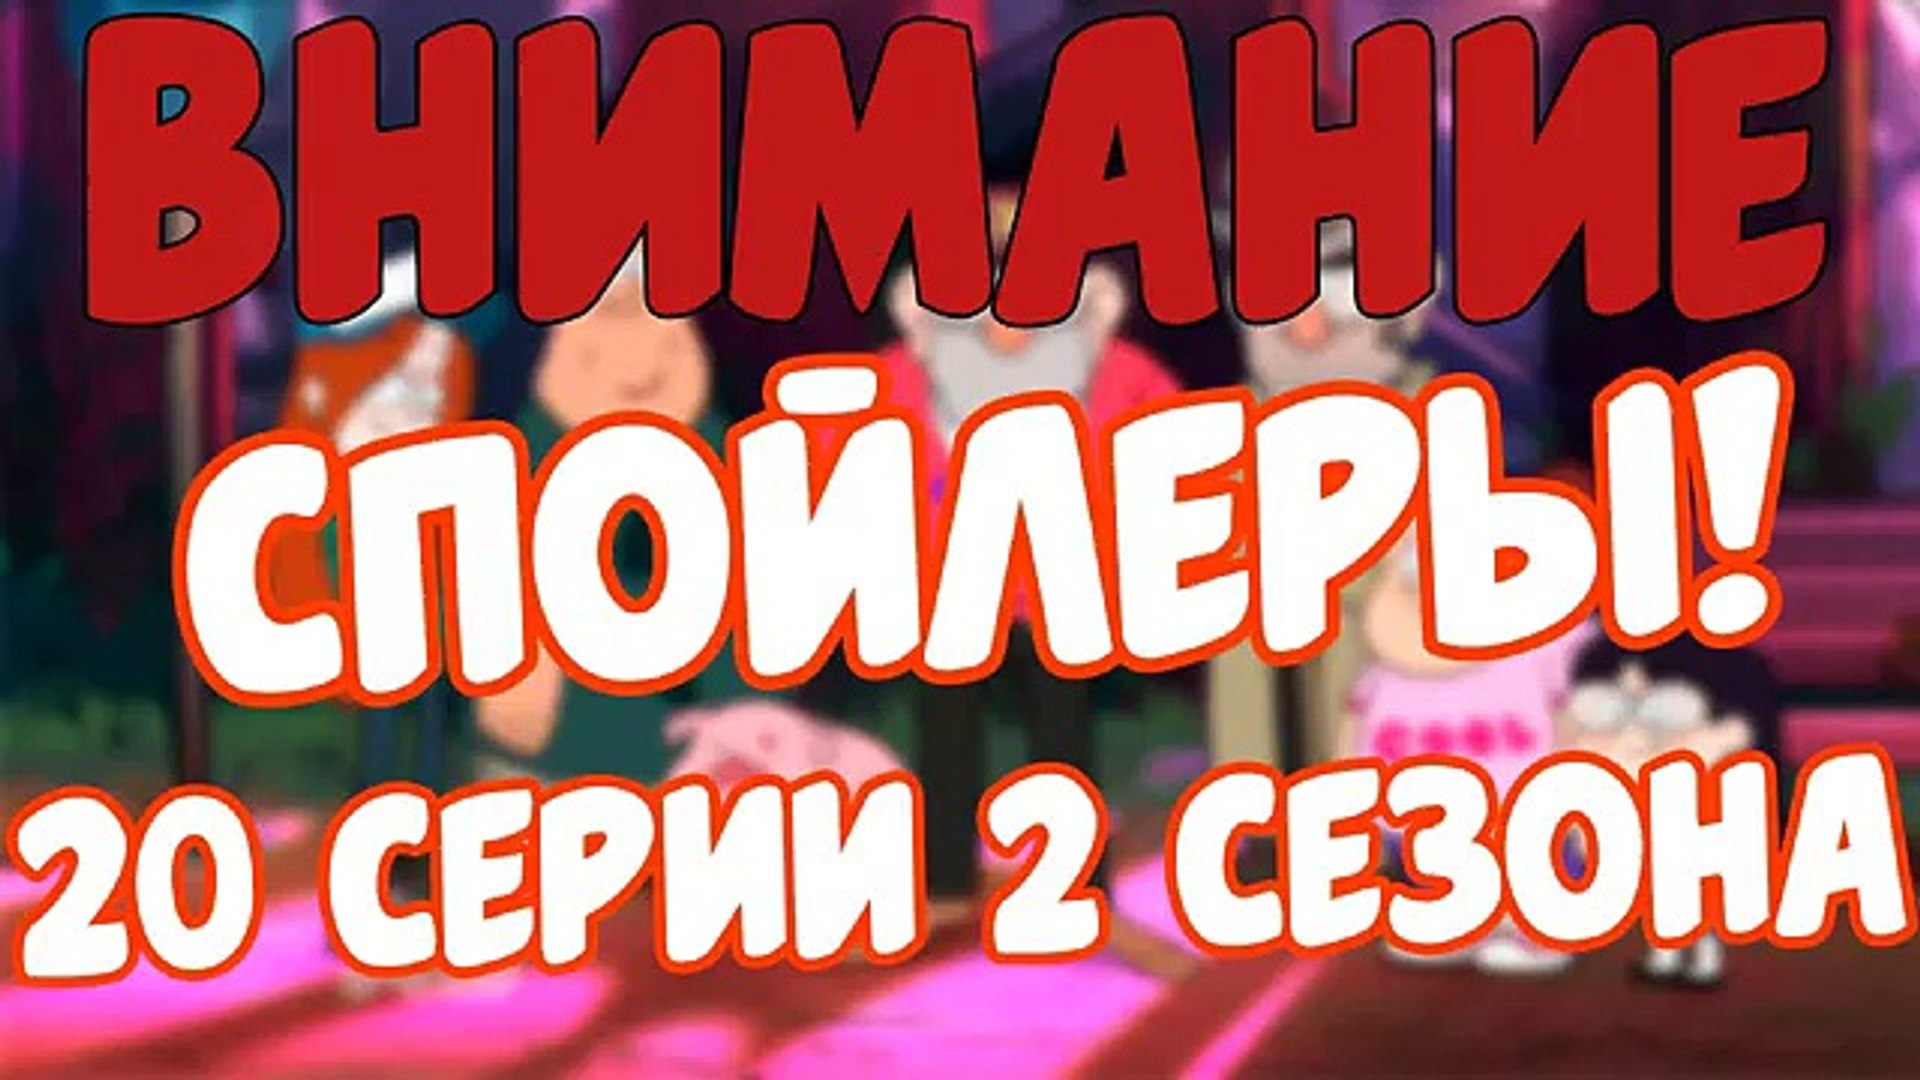 ВСЕ ЛЯПЫ В 20 СЕРИИ 2 СЕЗОНА ГРАВИТИ ФОЛЗ/ALL bloopers in 20 2 season Gravity Falls